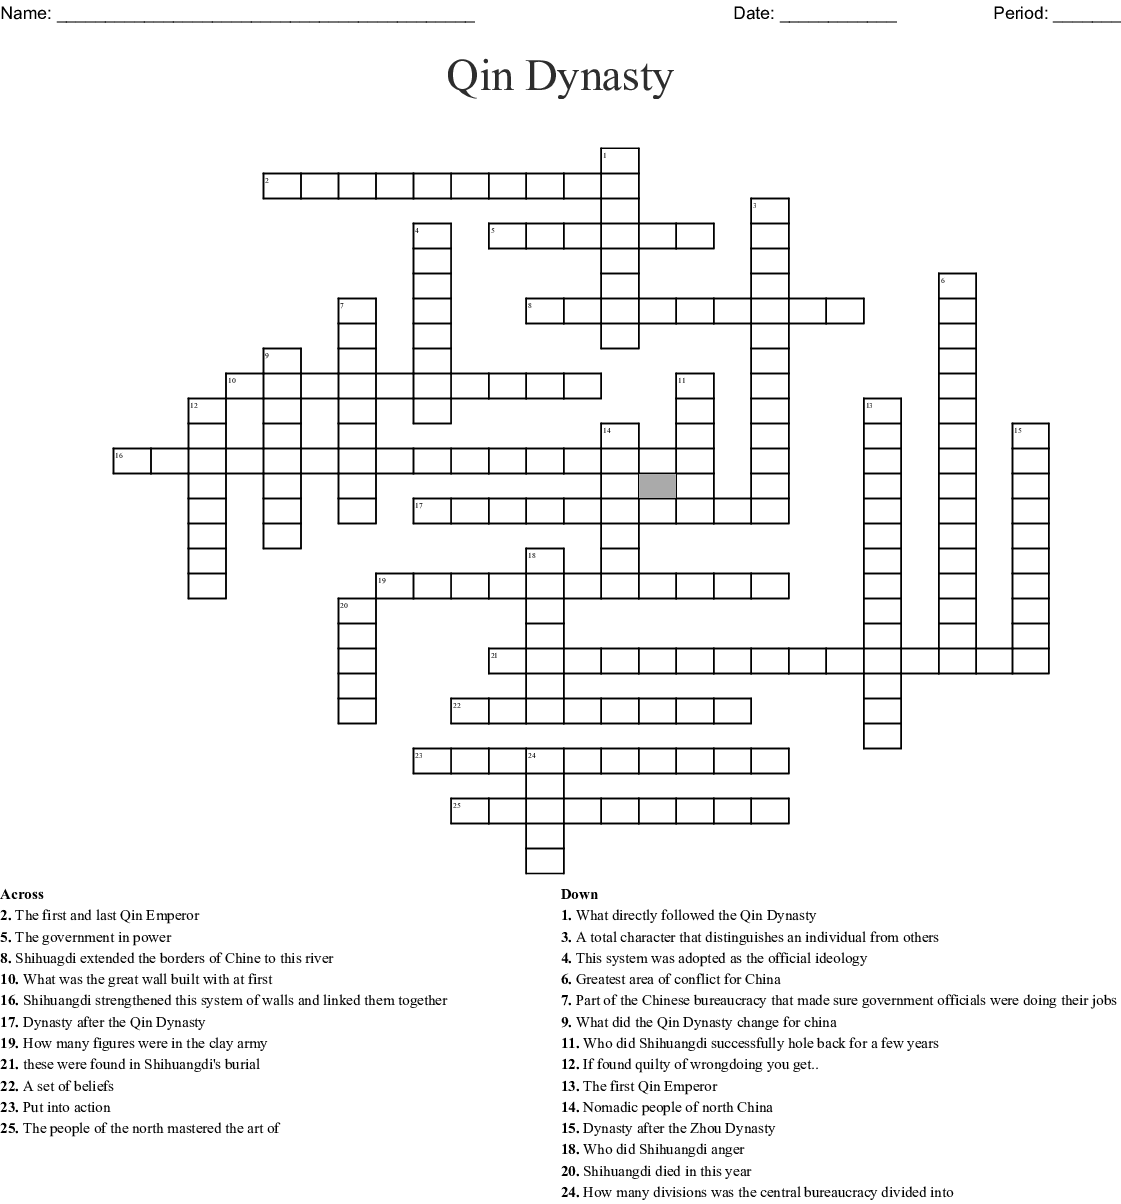 The Qin Dynasty Crossword